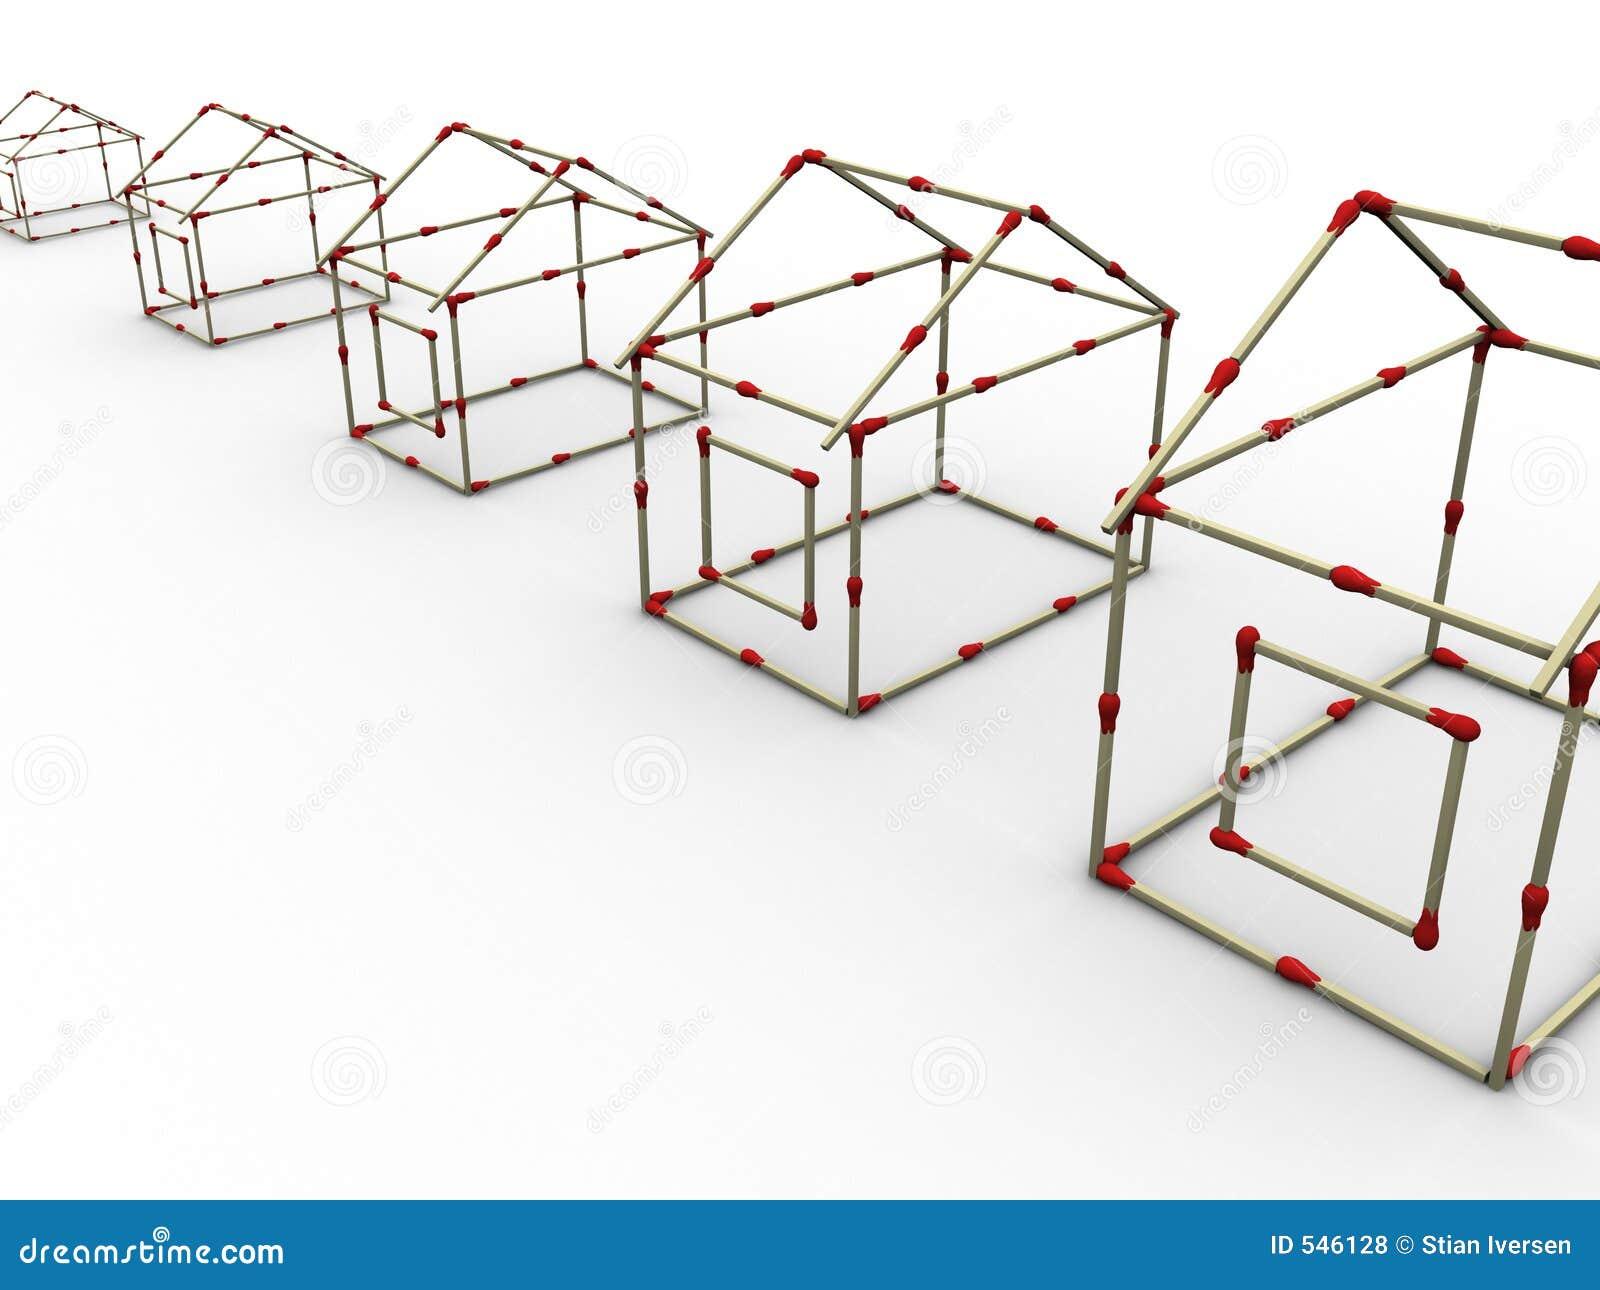 Download 2房子符合行 库存例证. 插画 包括有 布琼布拉, 翻译, 火柴梗, 列阵, 红色, 塑造, 站点, 房子, 警告 - 546128